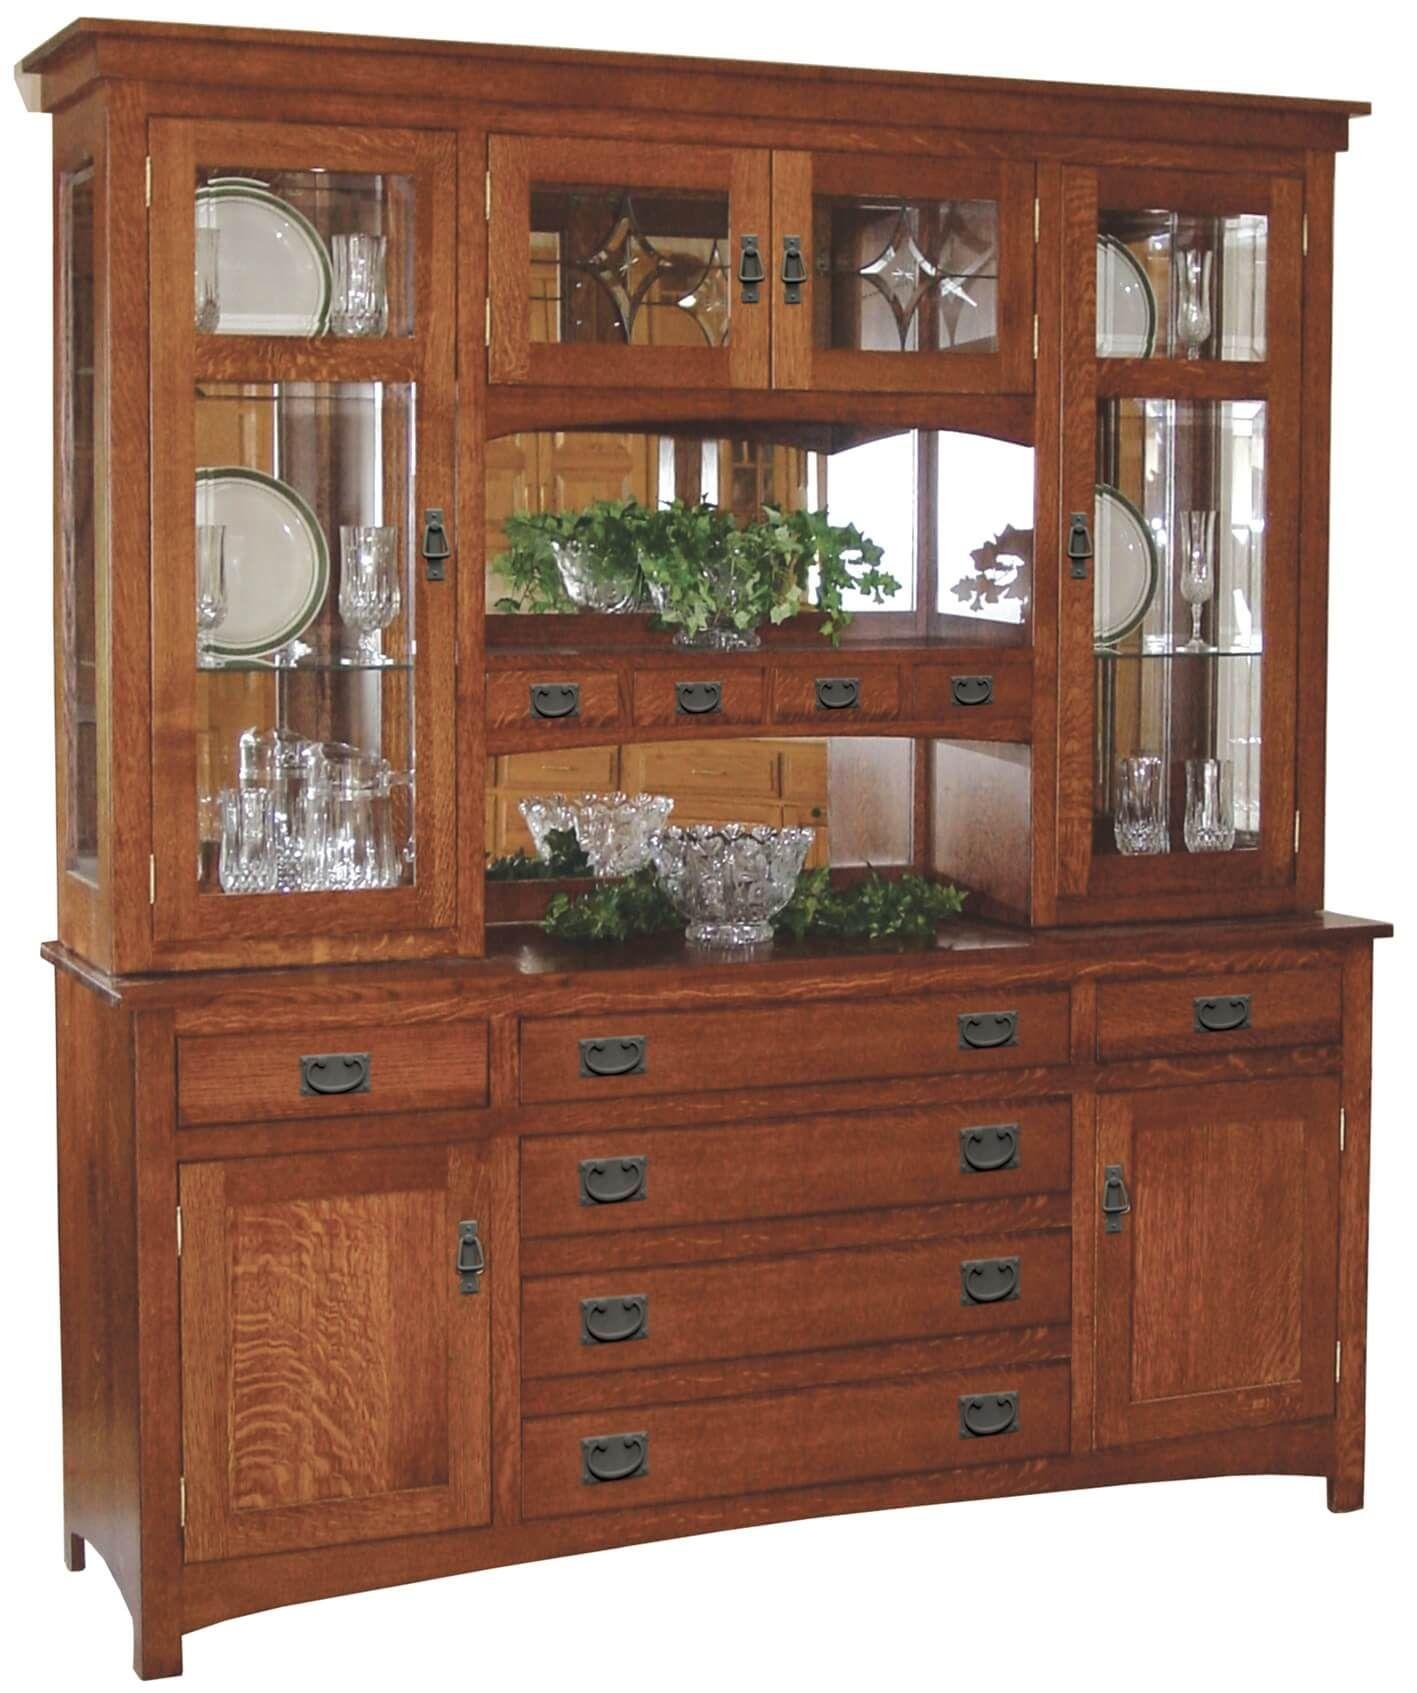 Americus Garden China Cabinet